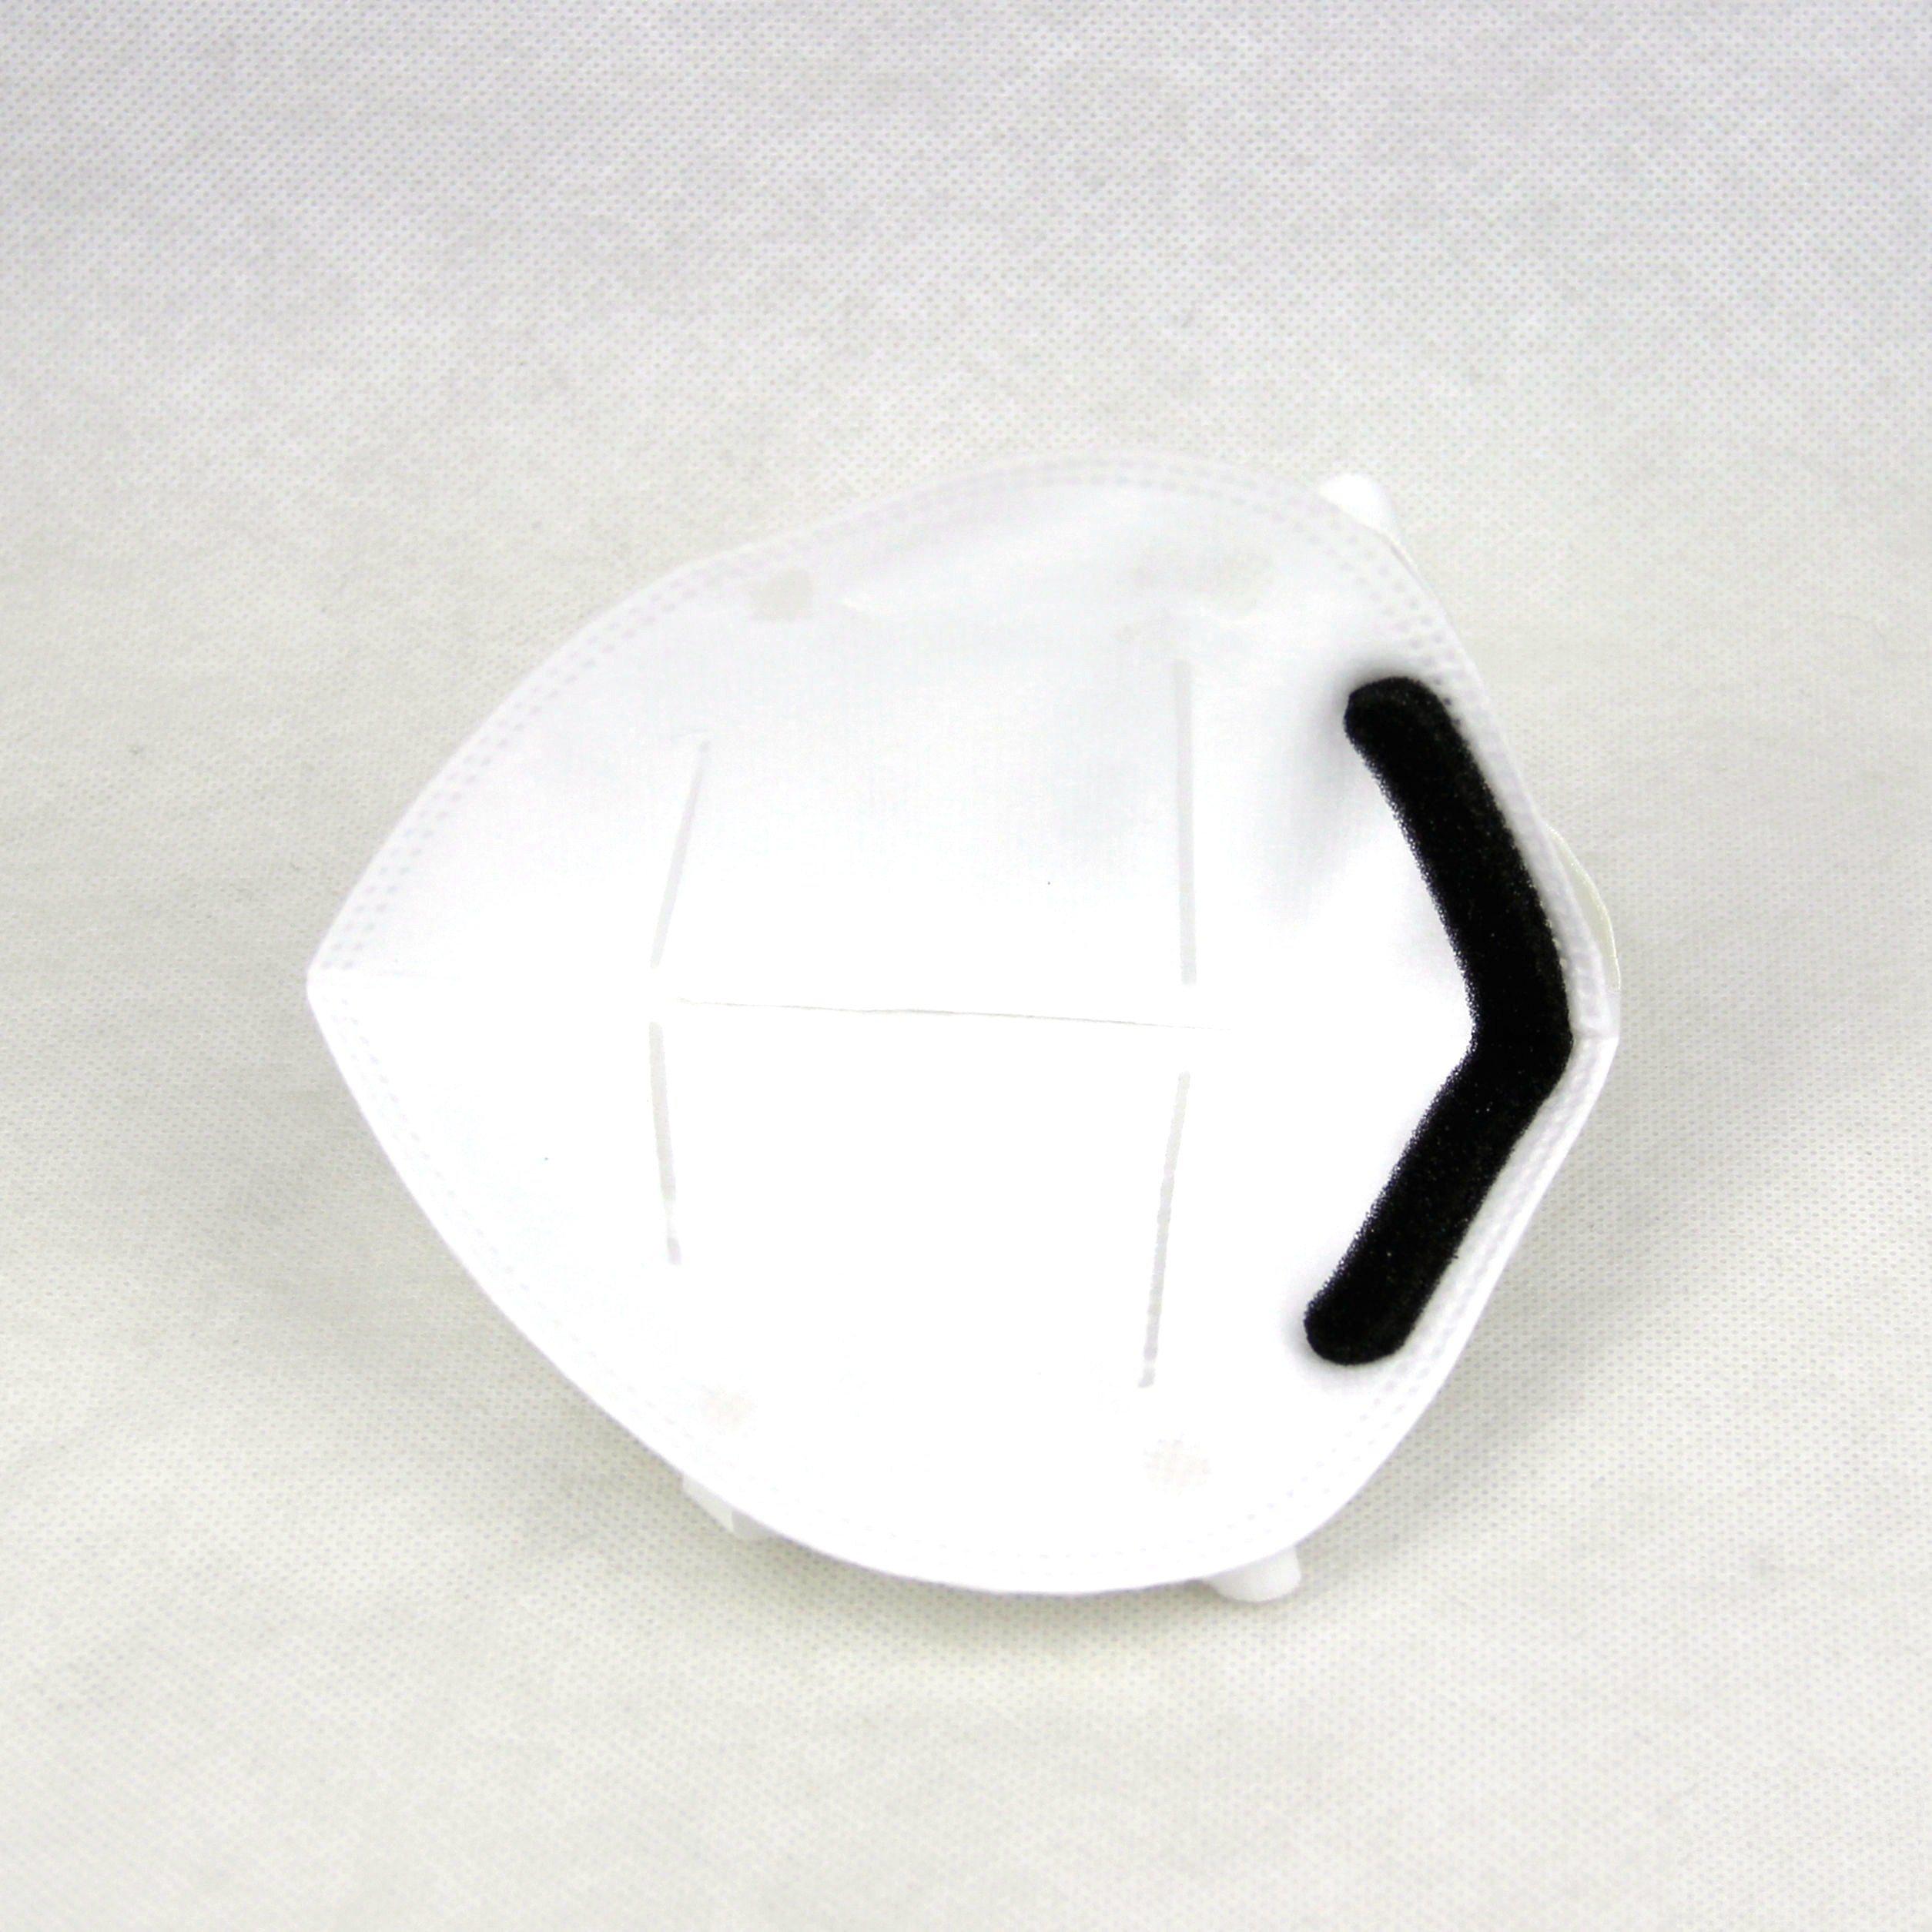 medical n95 mask disposable